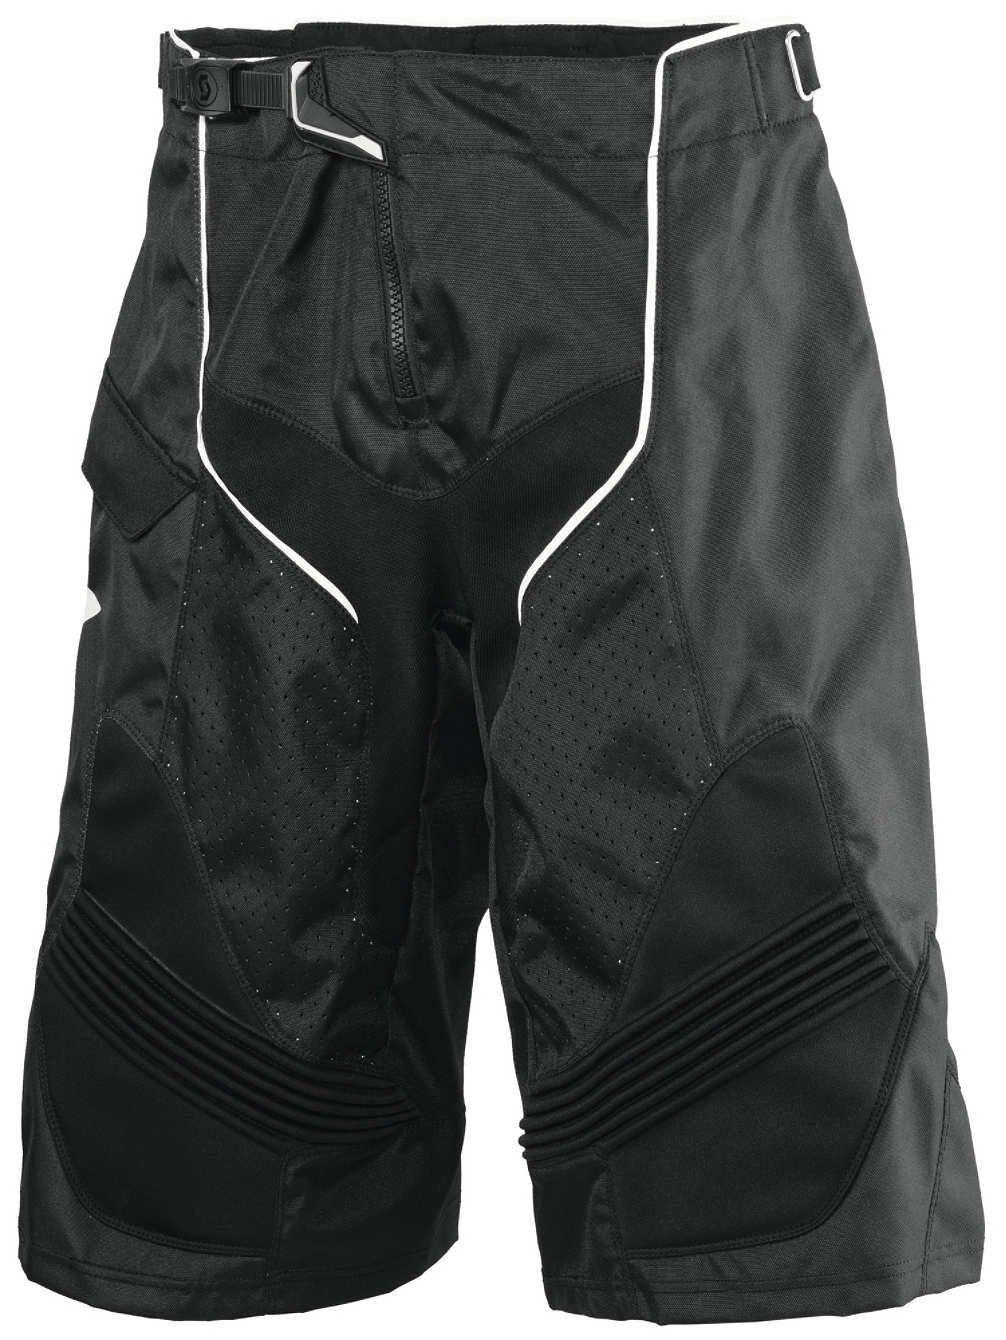 Pantalone Bici Enduro Style Dh Scott Shorts Ls Fit black